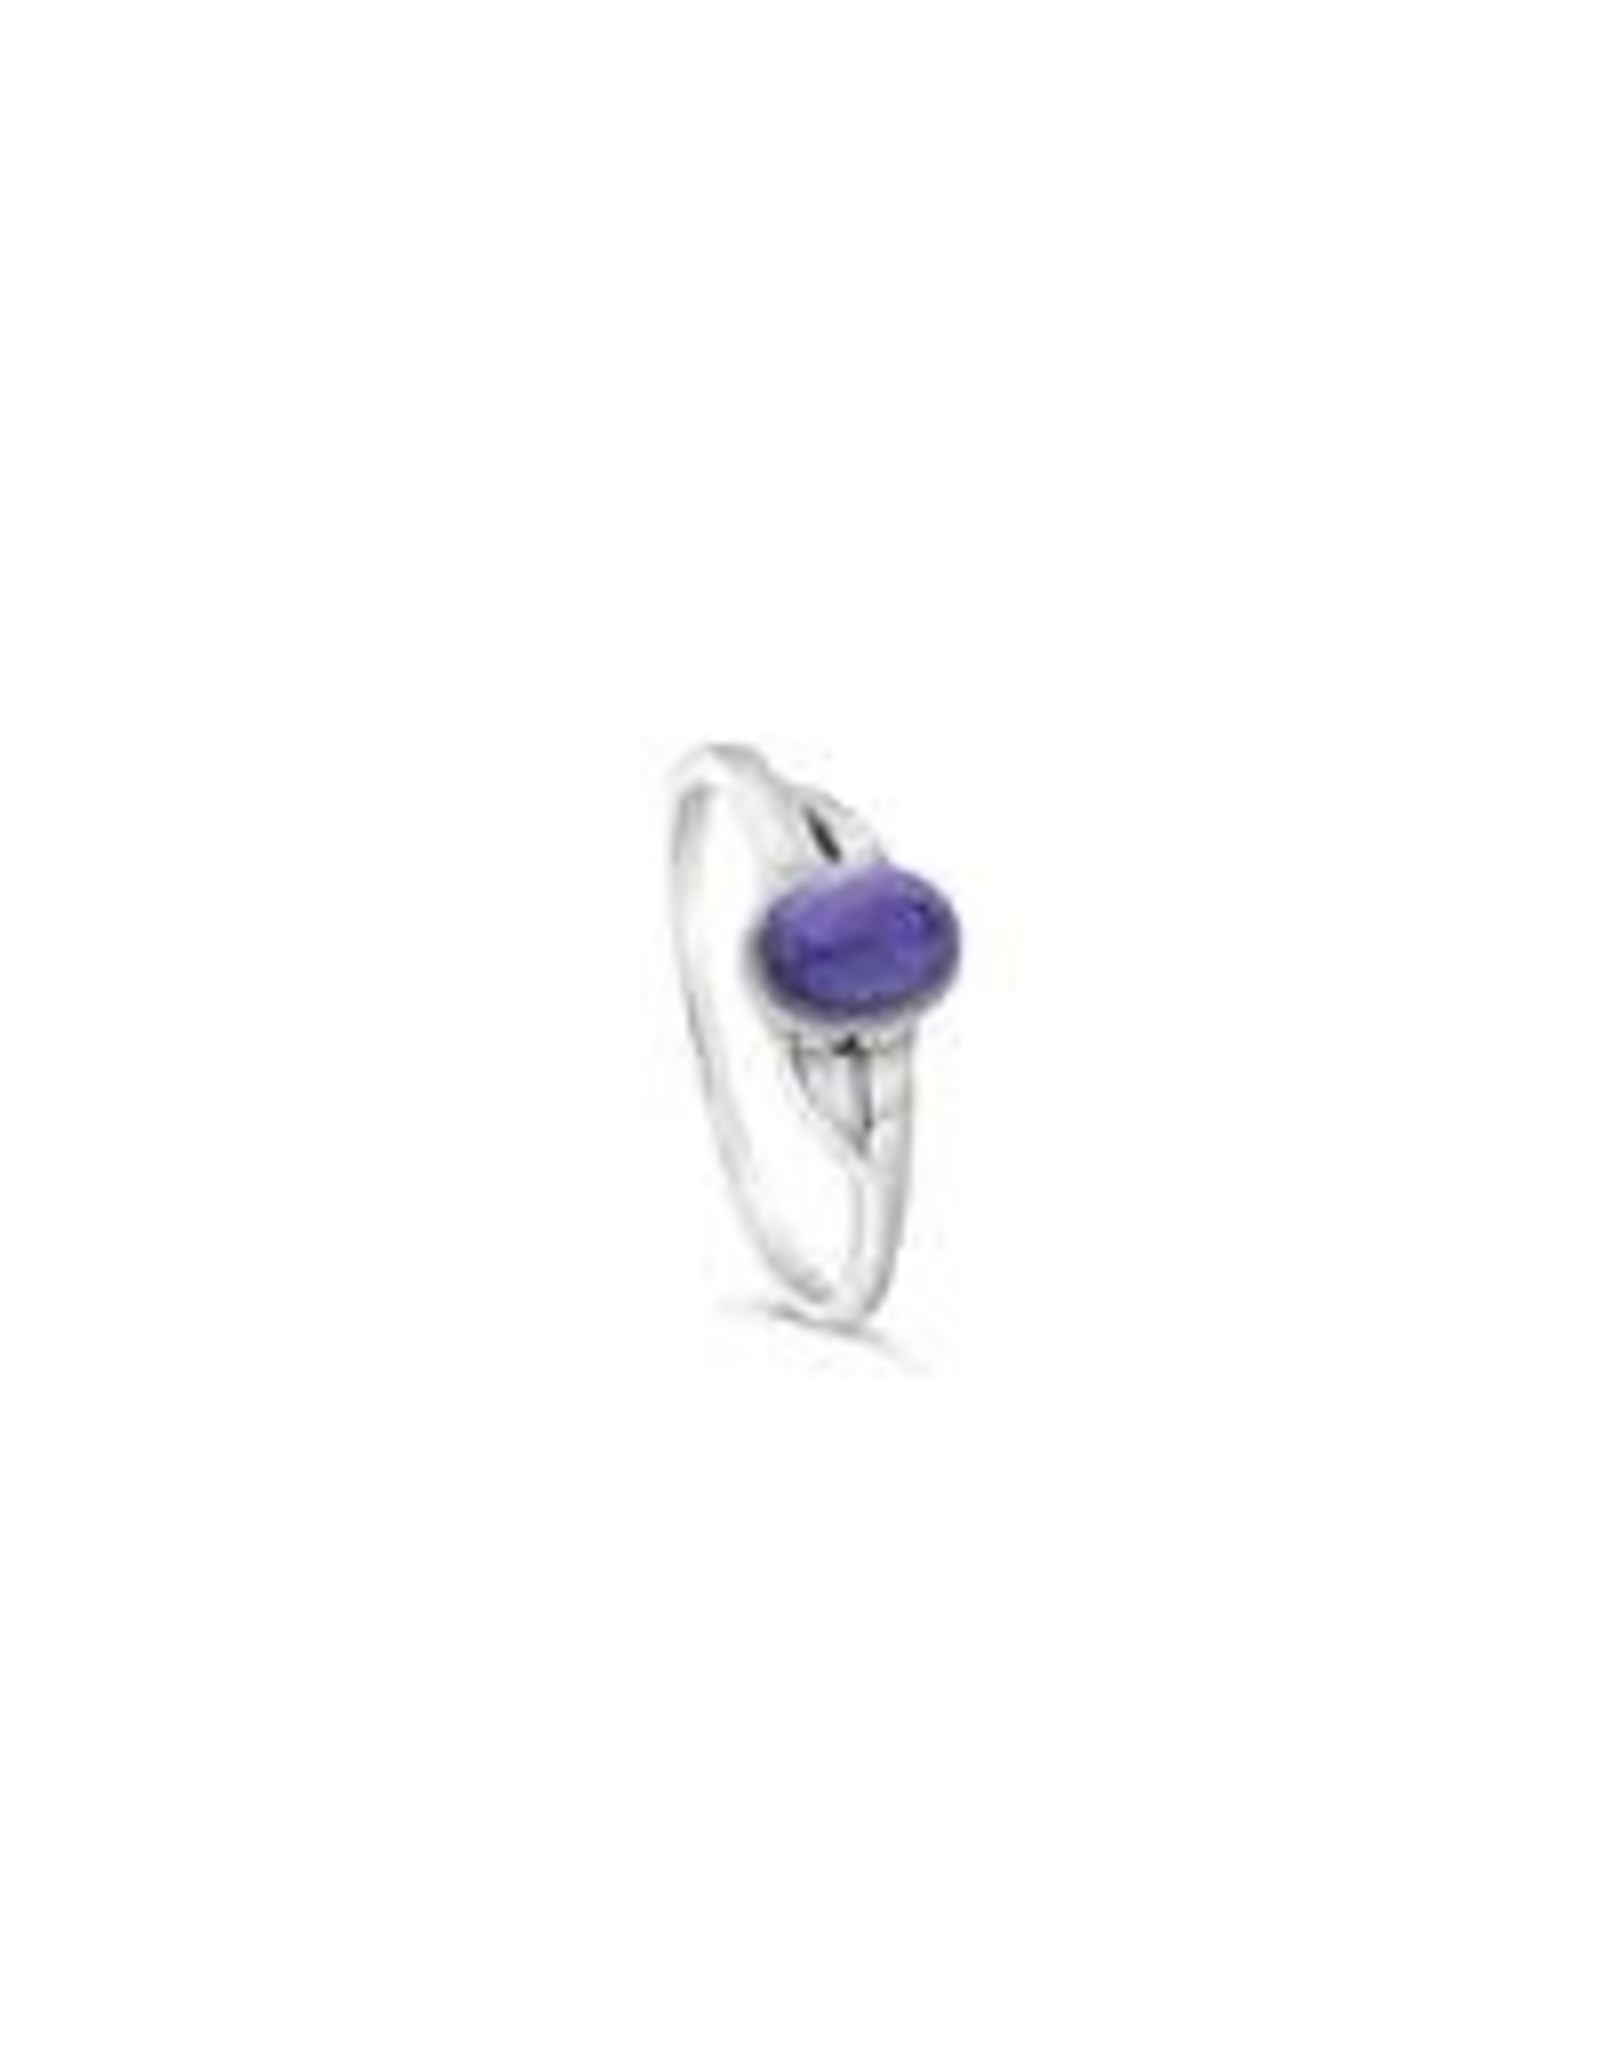 Stones & Silver Amethyst Ring 5x7mm